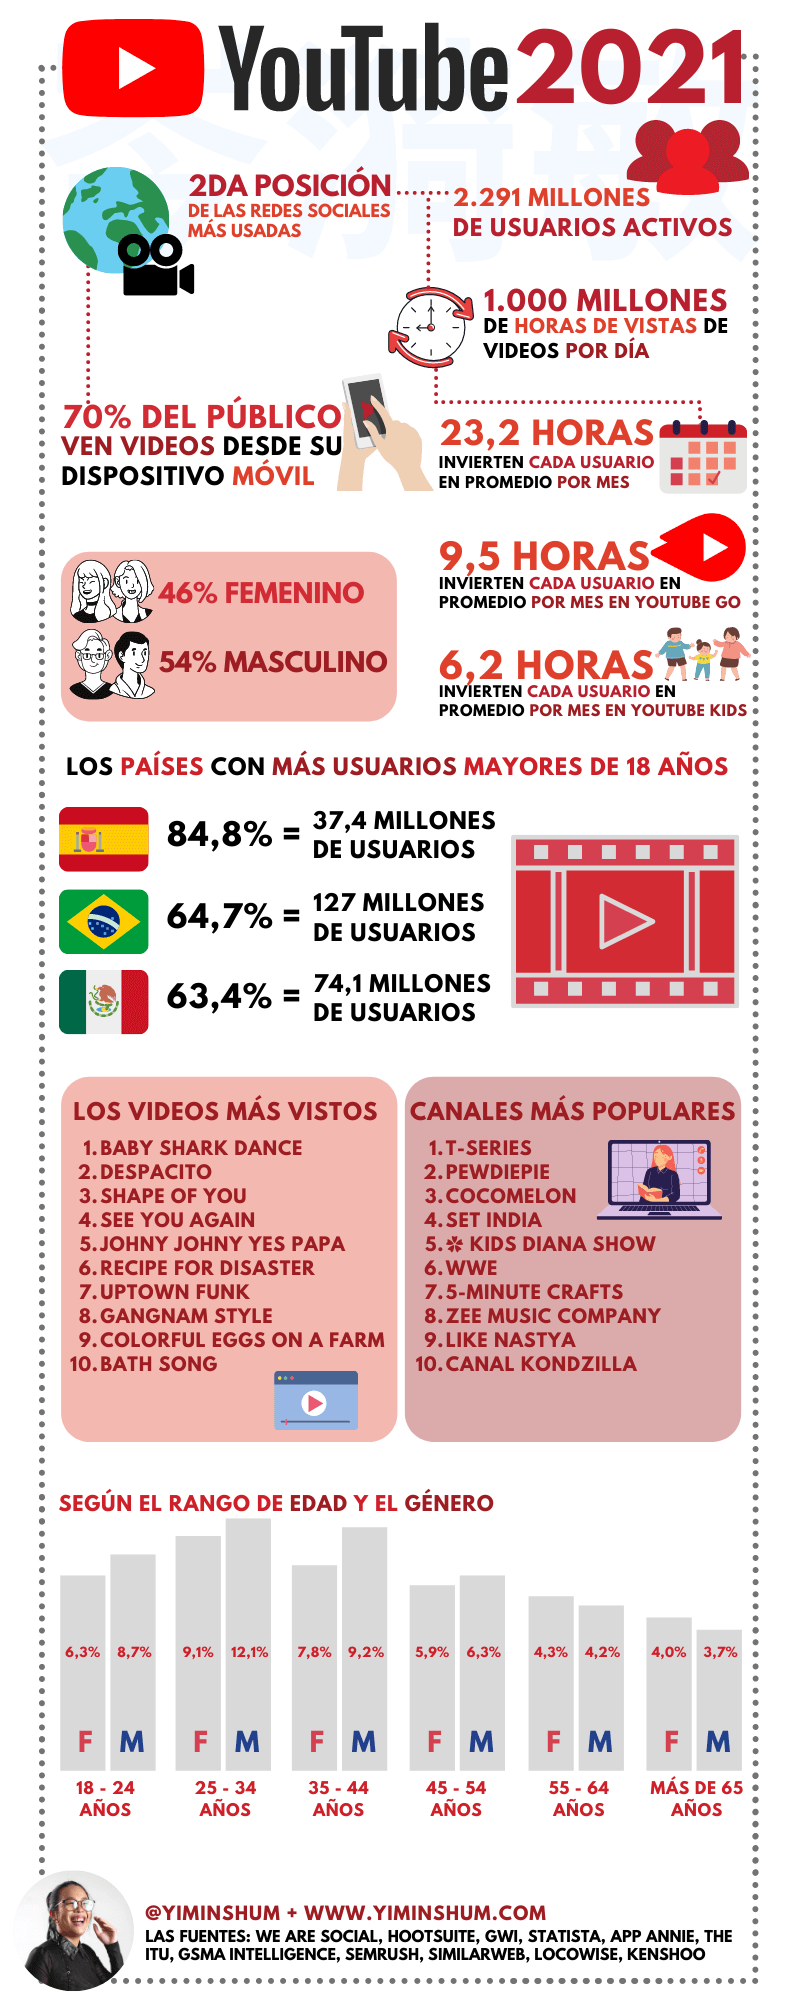 Los datos de YouTube en 2021 #infografia #infographic #socialmedia